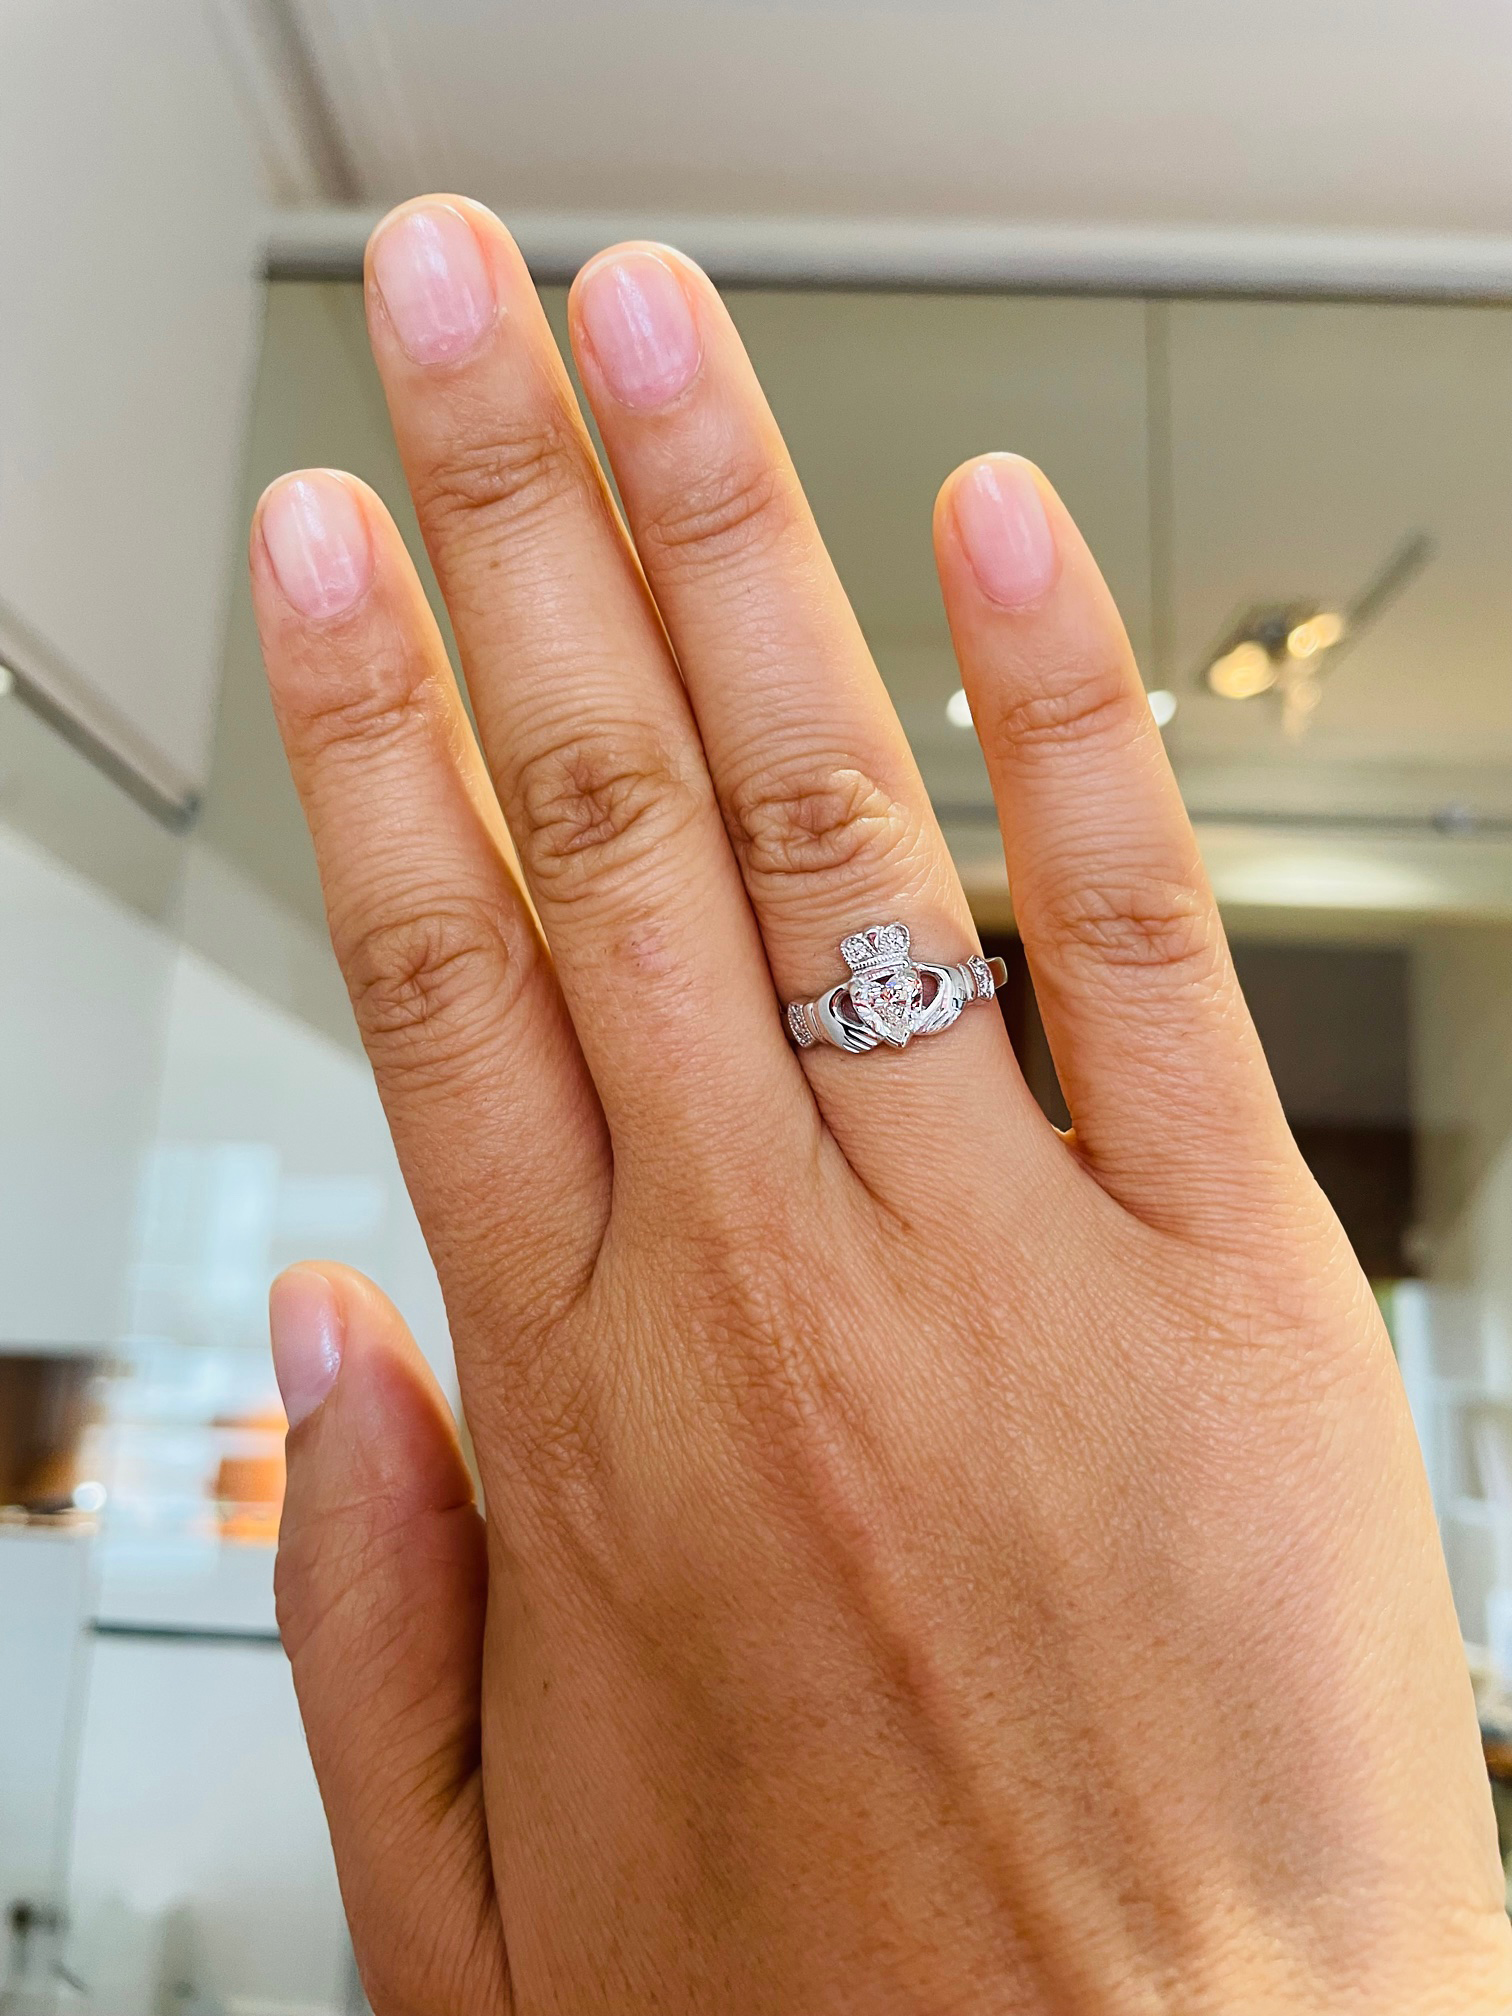 Full Heartshape 0.50cts HVS1 Diamond Claddagh Engagement Ring